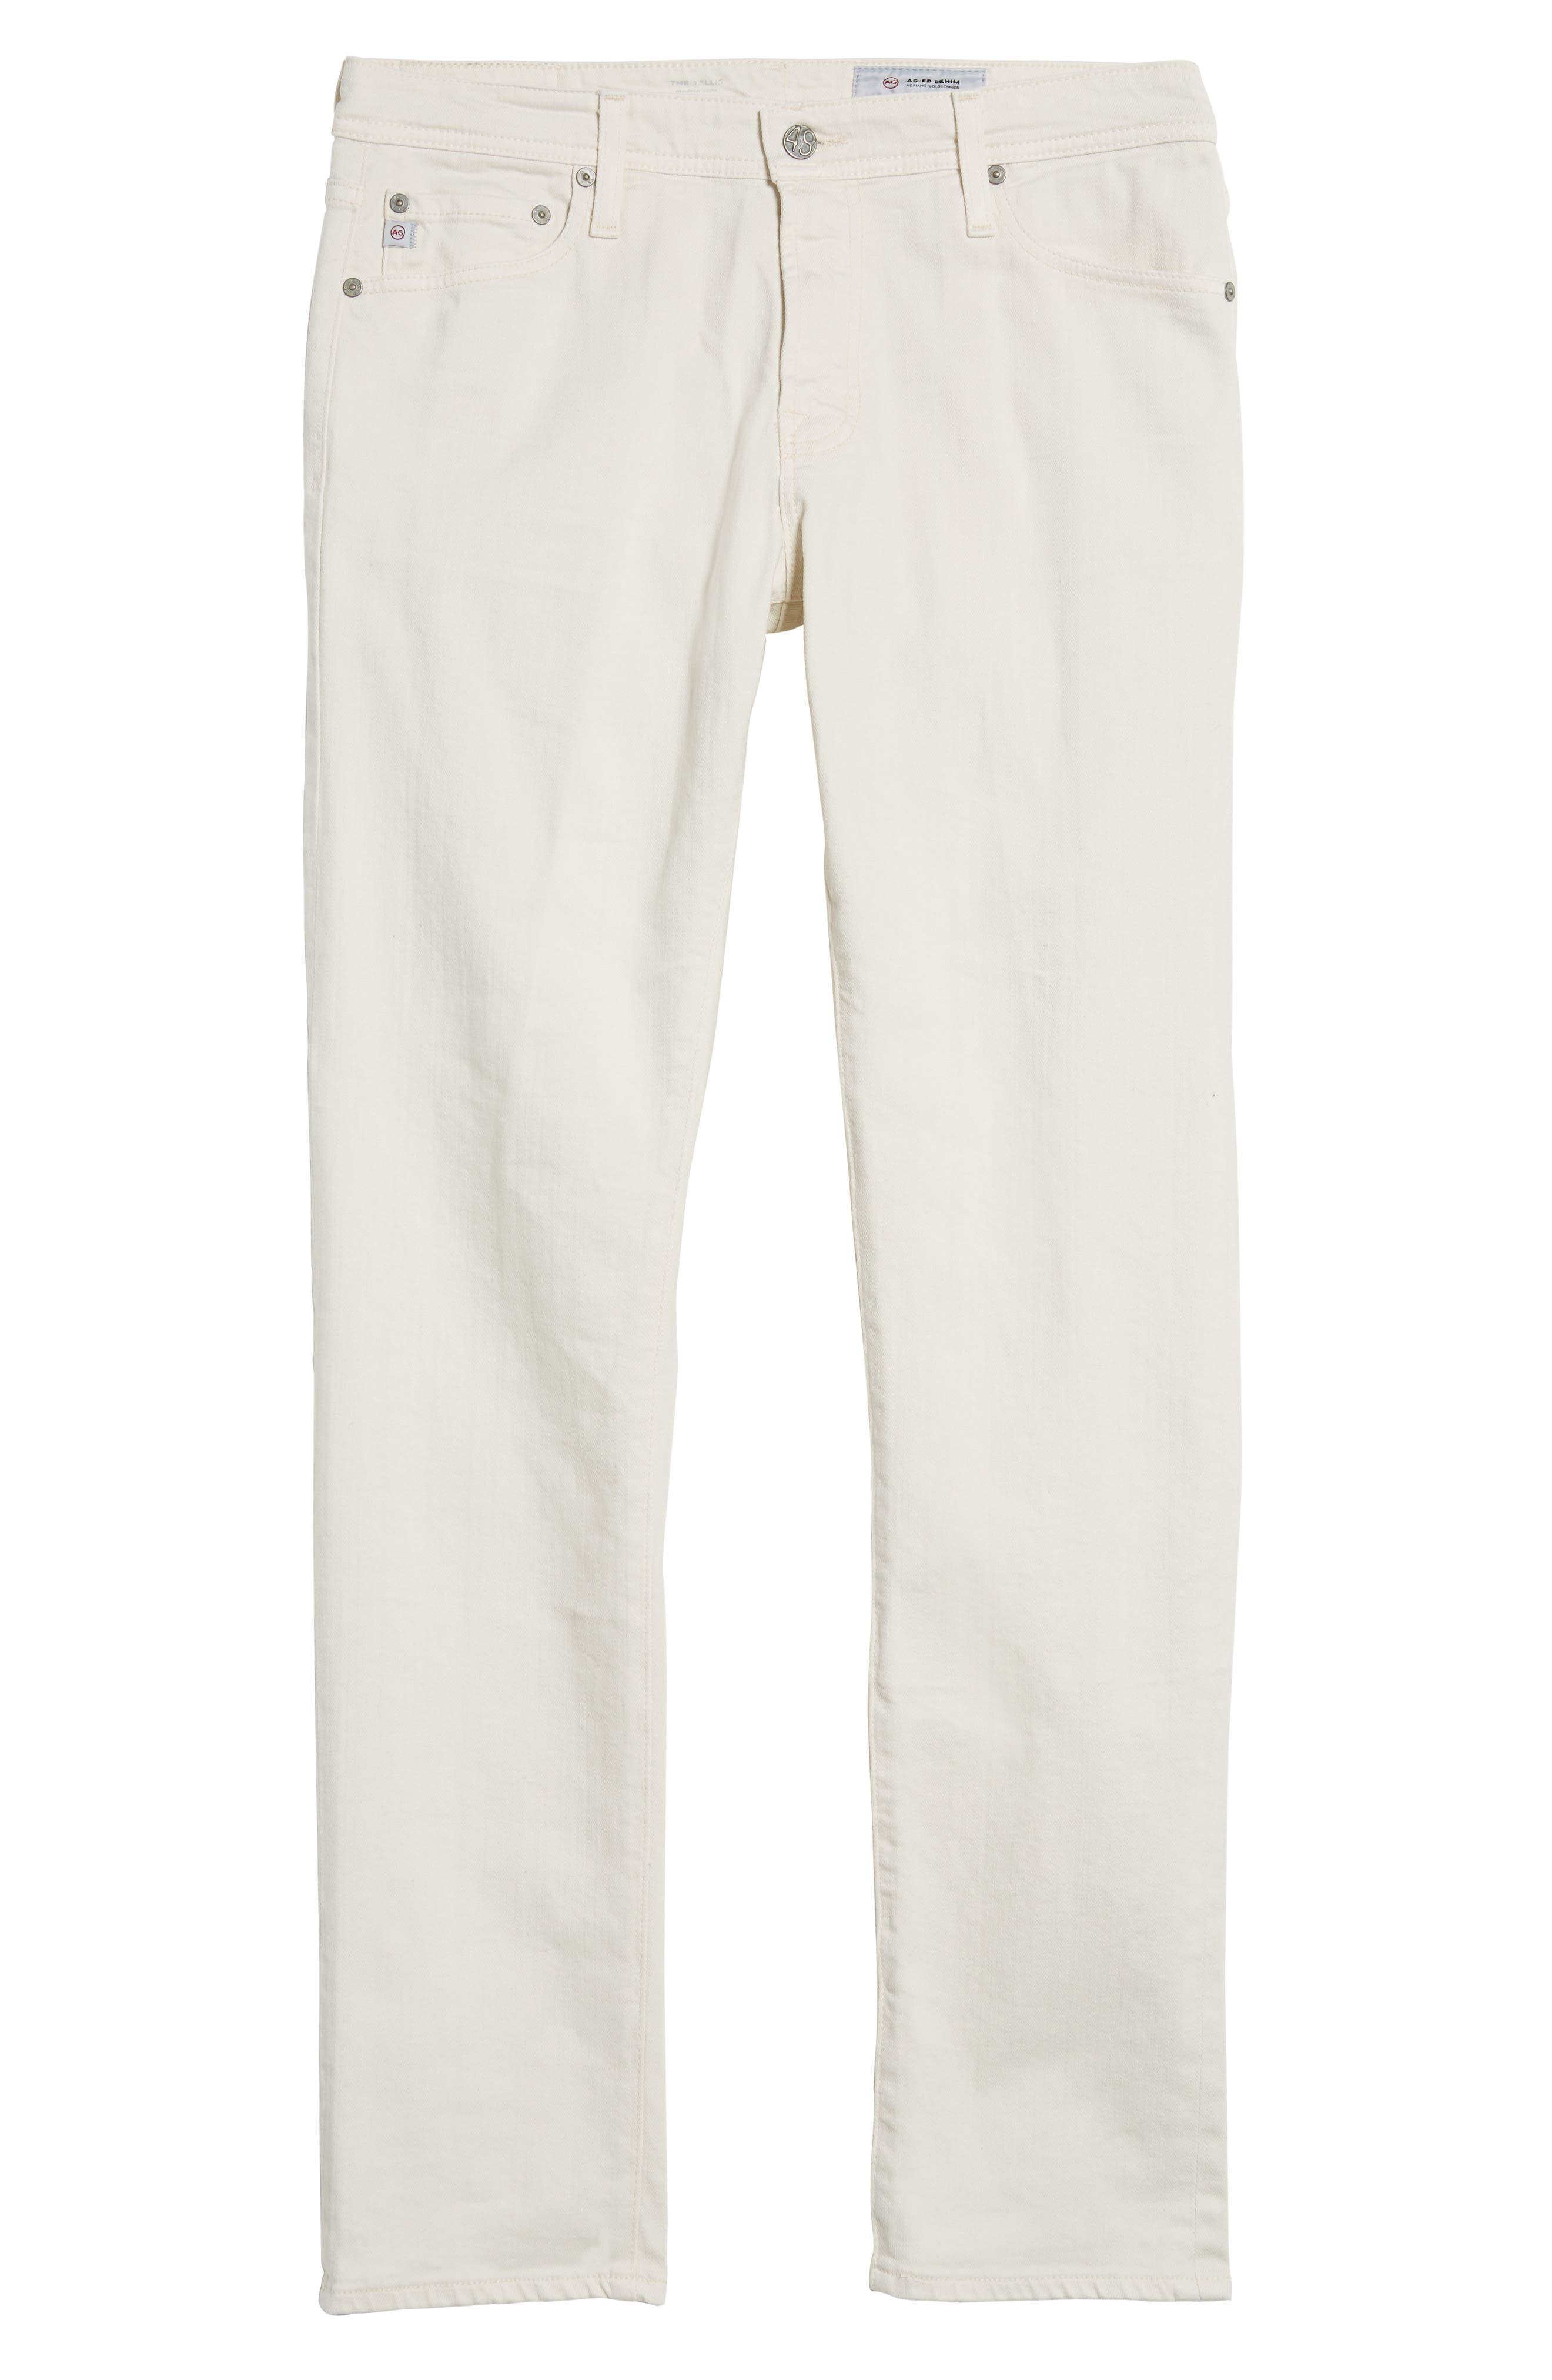 Tellis Modern Slim Twill Pants,                             Alternate thumbnail 6, color,                             020